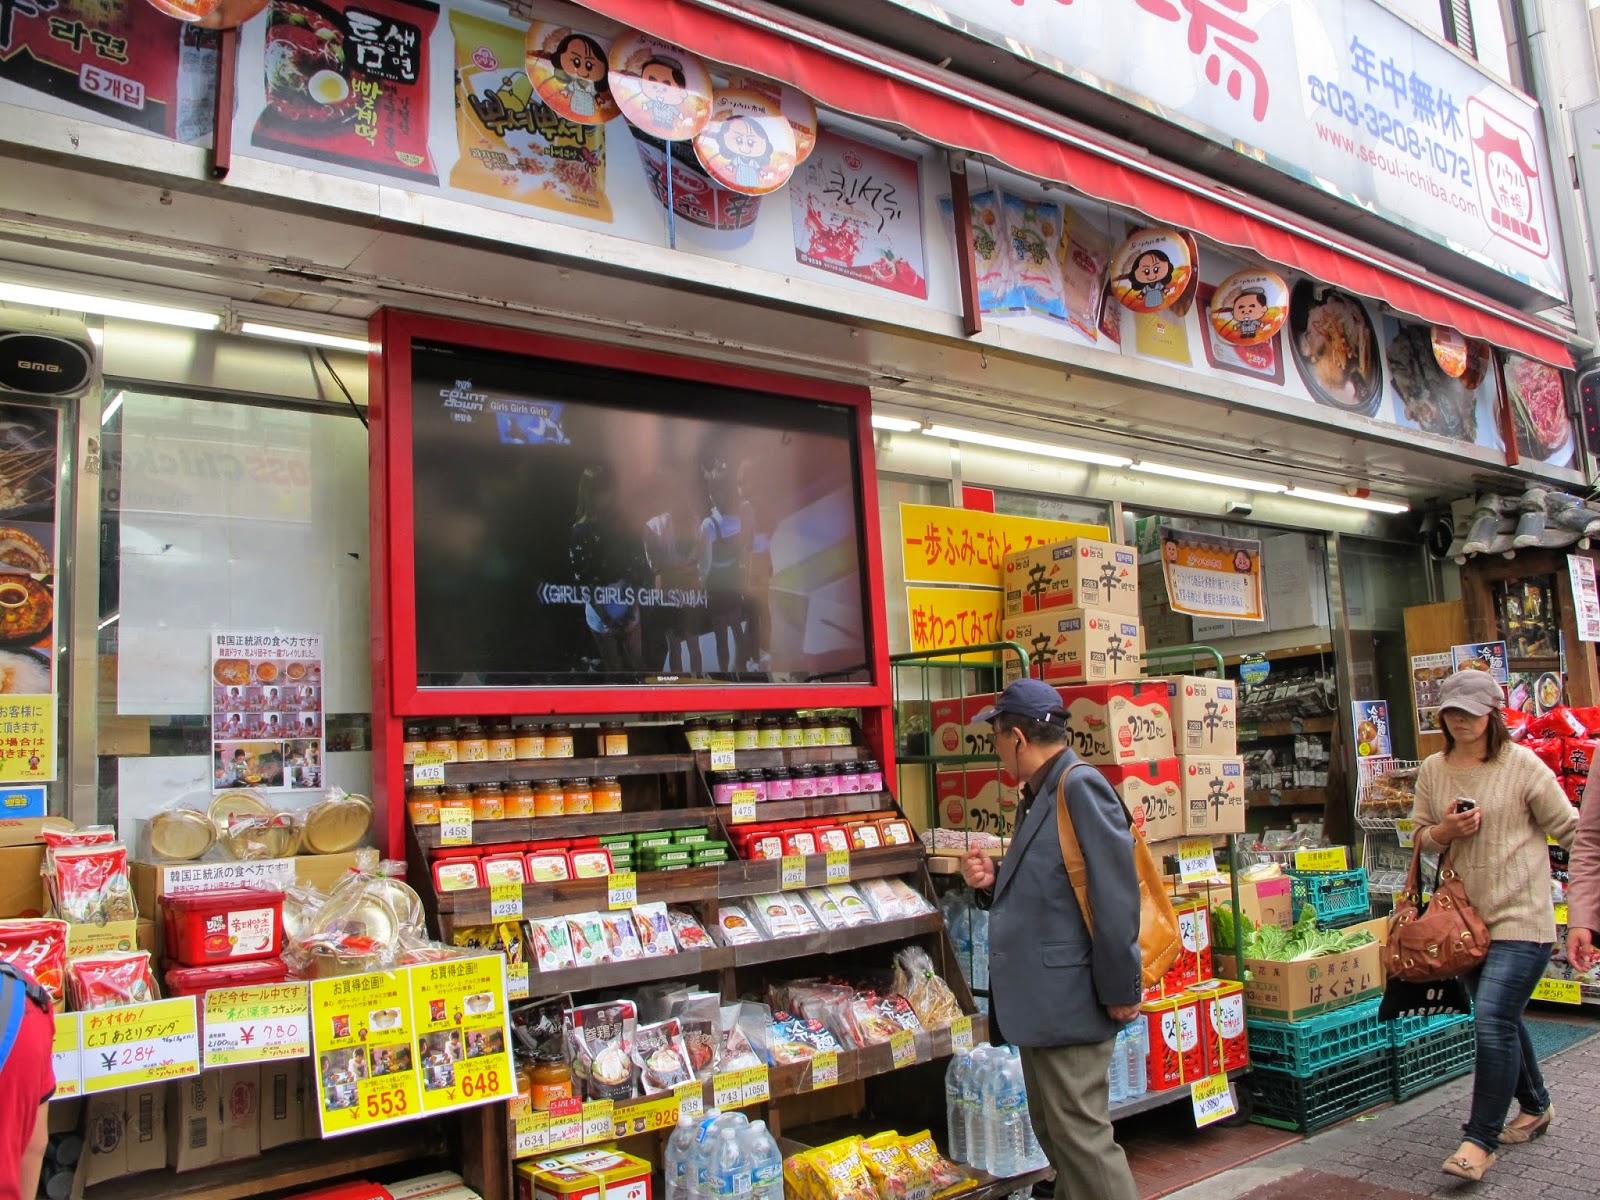 Tokyo Part 3: Shin-Okubo (Korean Boy Band Land) ~ Jenna in Japan